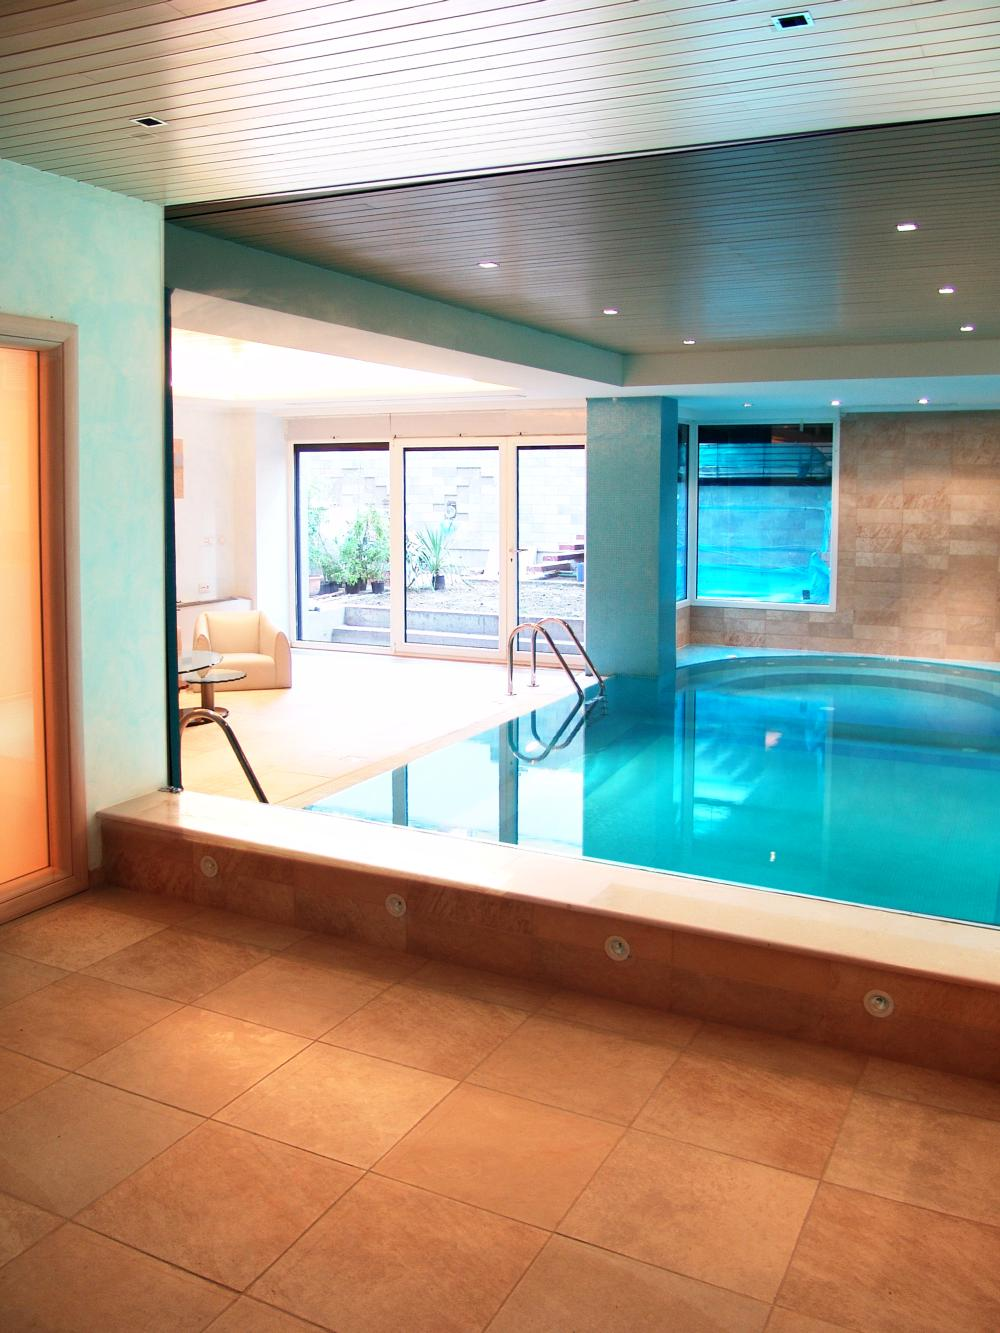 https://nbc-arhitect.ro/wp-content/uploads/2020/10/NBC-Arhitect-_-Cube-House-_-Bucharest-Romania-_-interior-view_swimming-pool.jpg